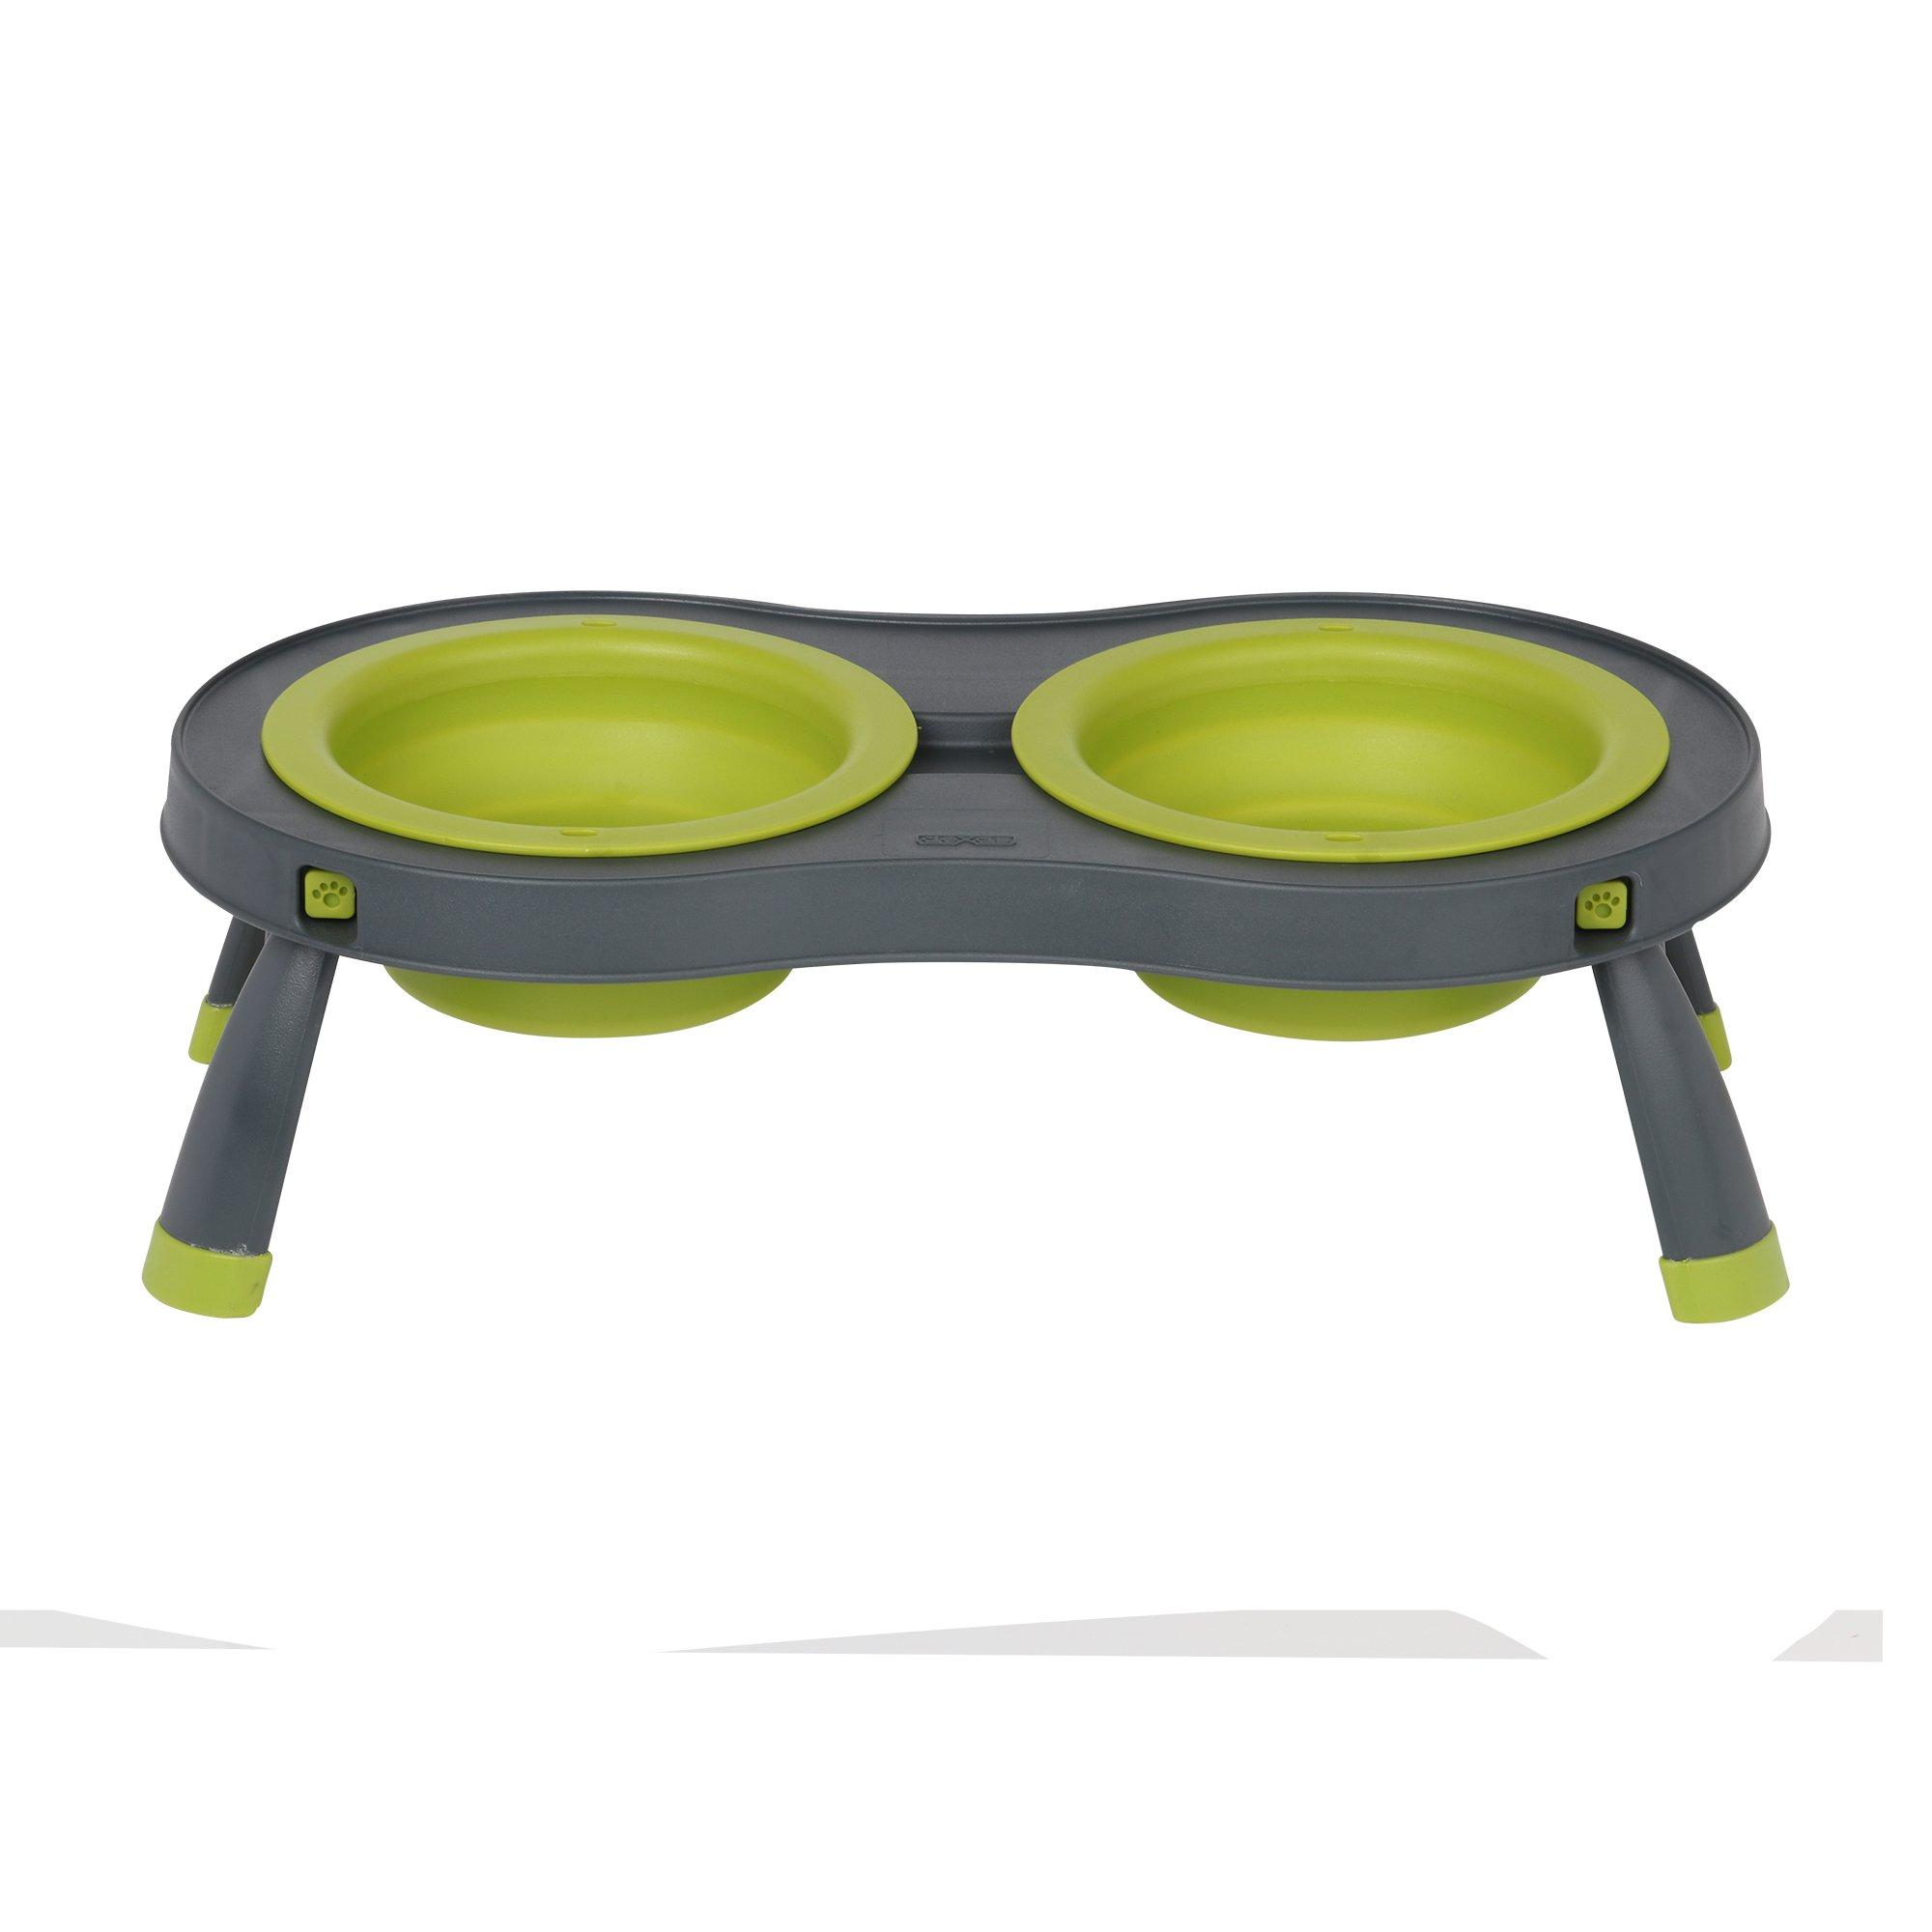 Dexas green grey collapsible pet feeder petco for Feeder fish petco